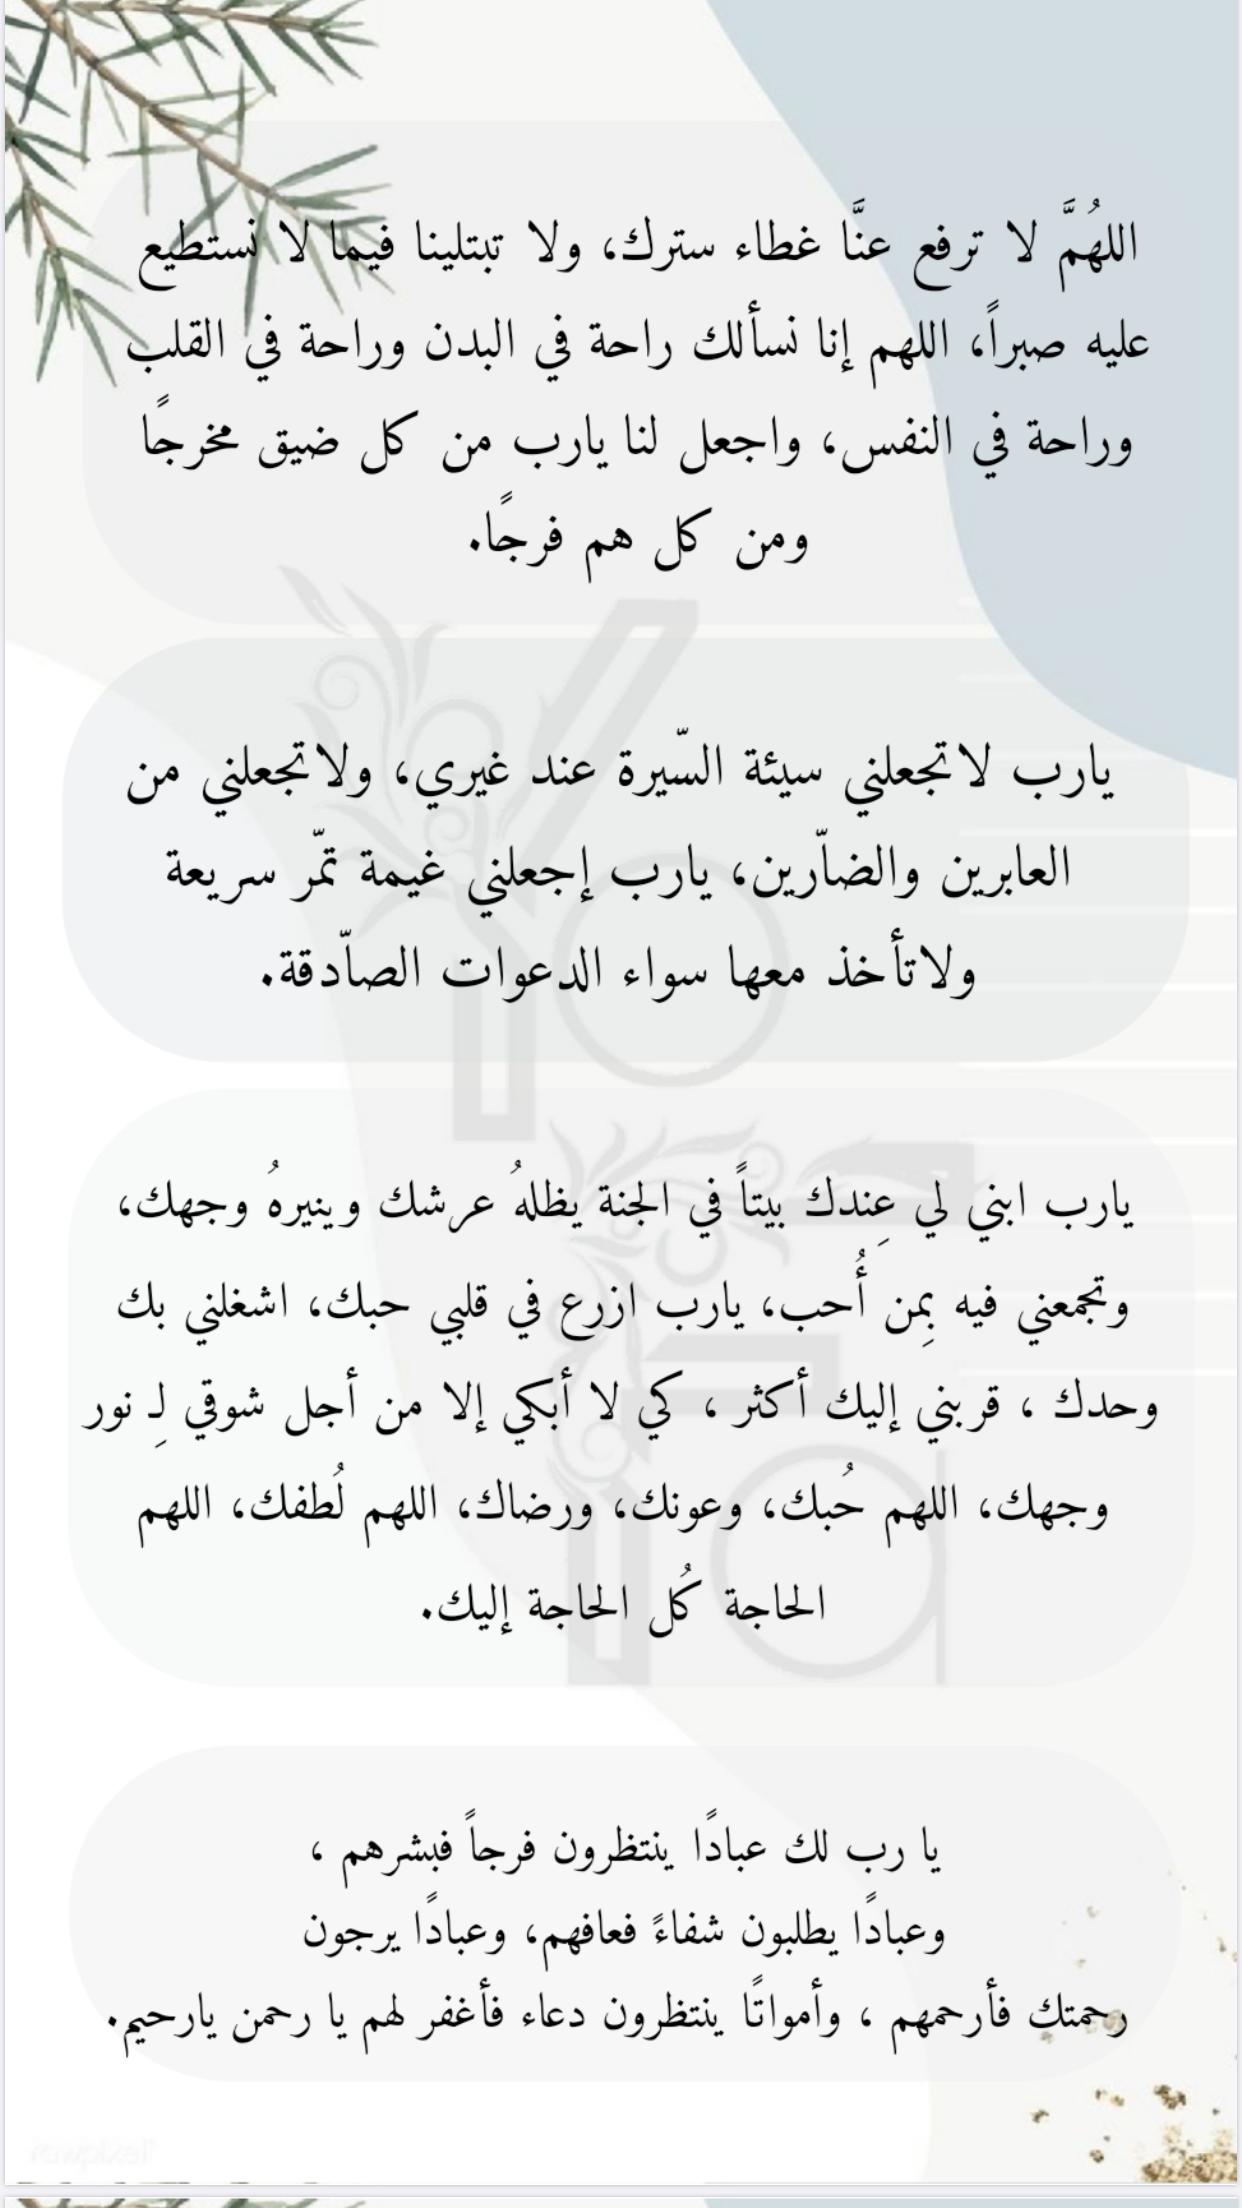 ادعية رمضان دعاء ليلة القدر صور Quotes For Book Lovers Quran Quotes Love Islamic Inspirational Quotes